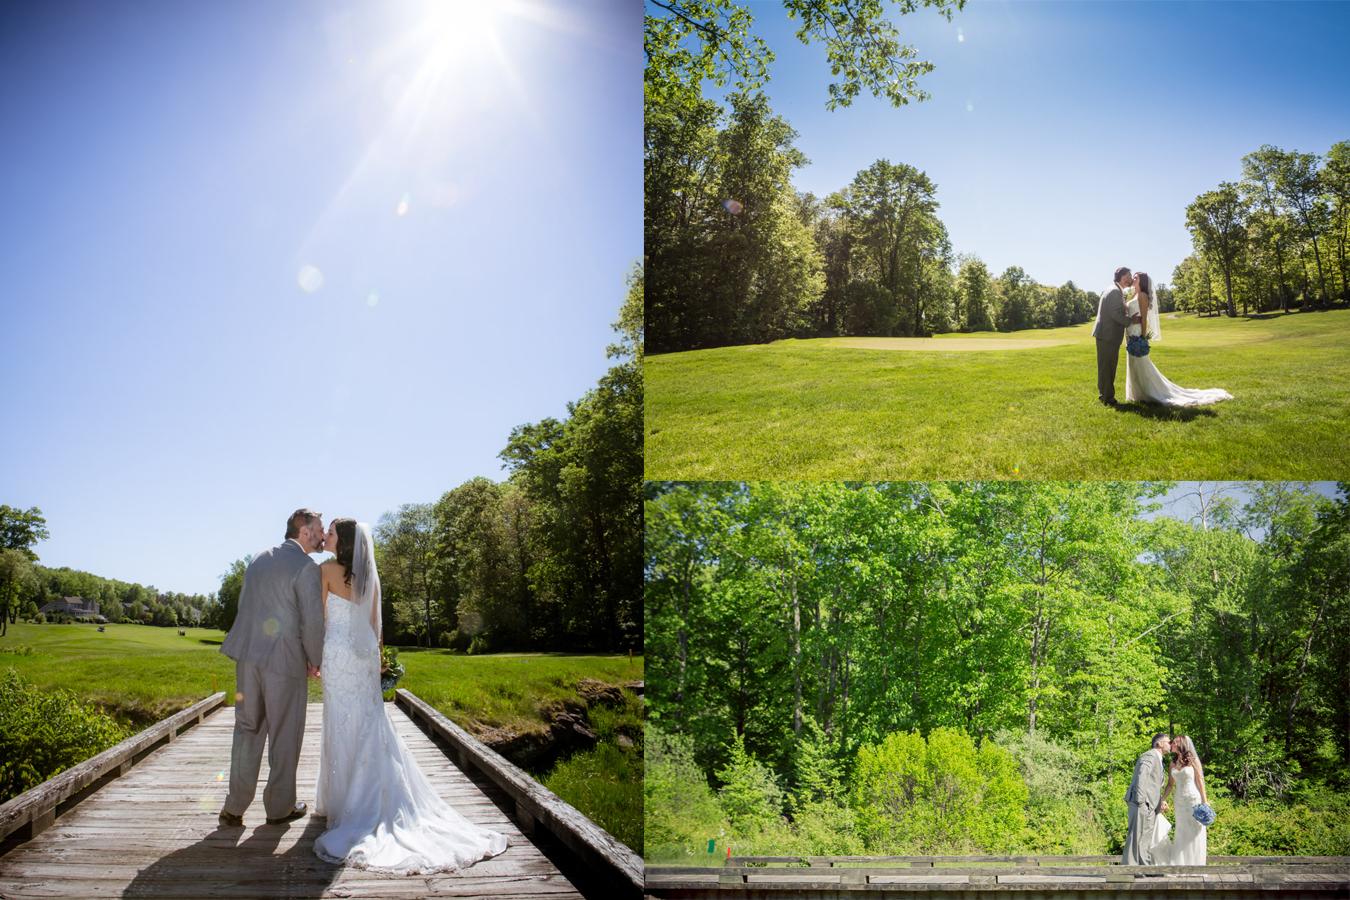 NEPA_Pocono_Weddings_Rob_Lettieri_Photography_06.jpg